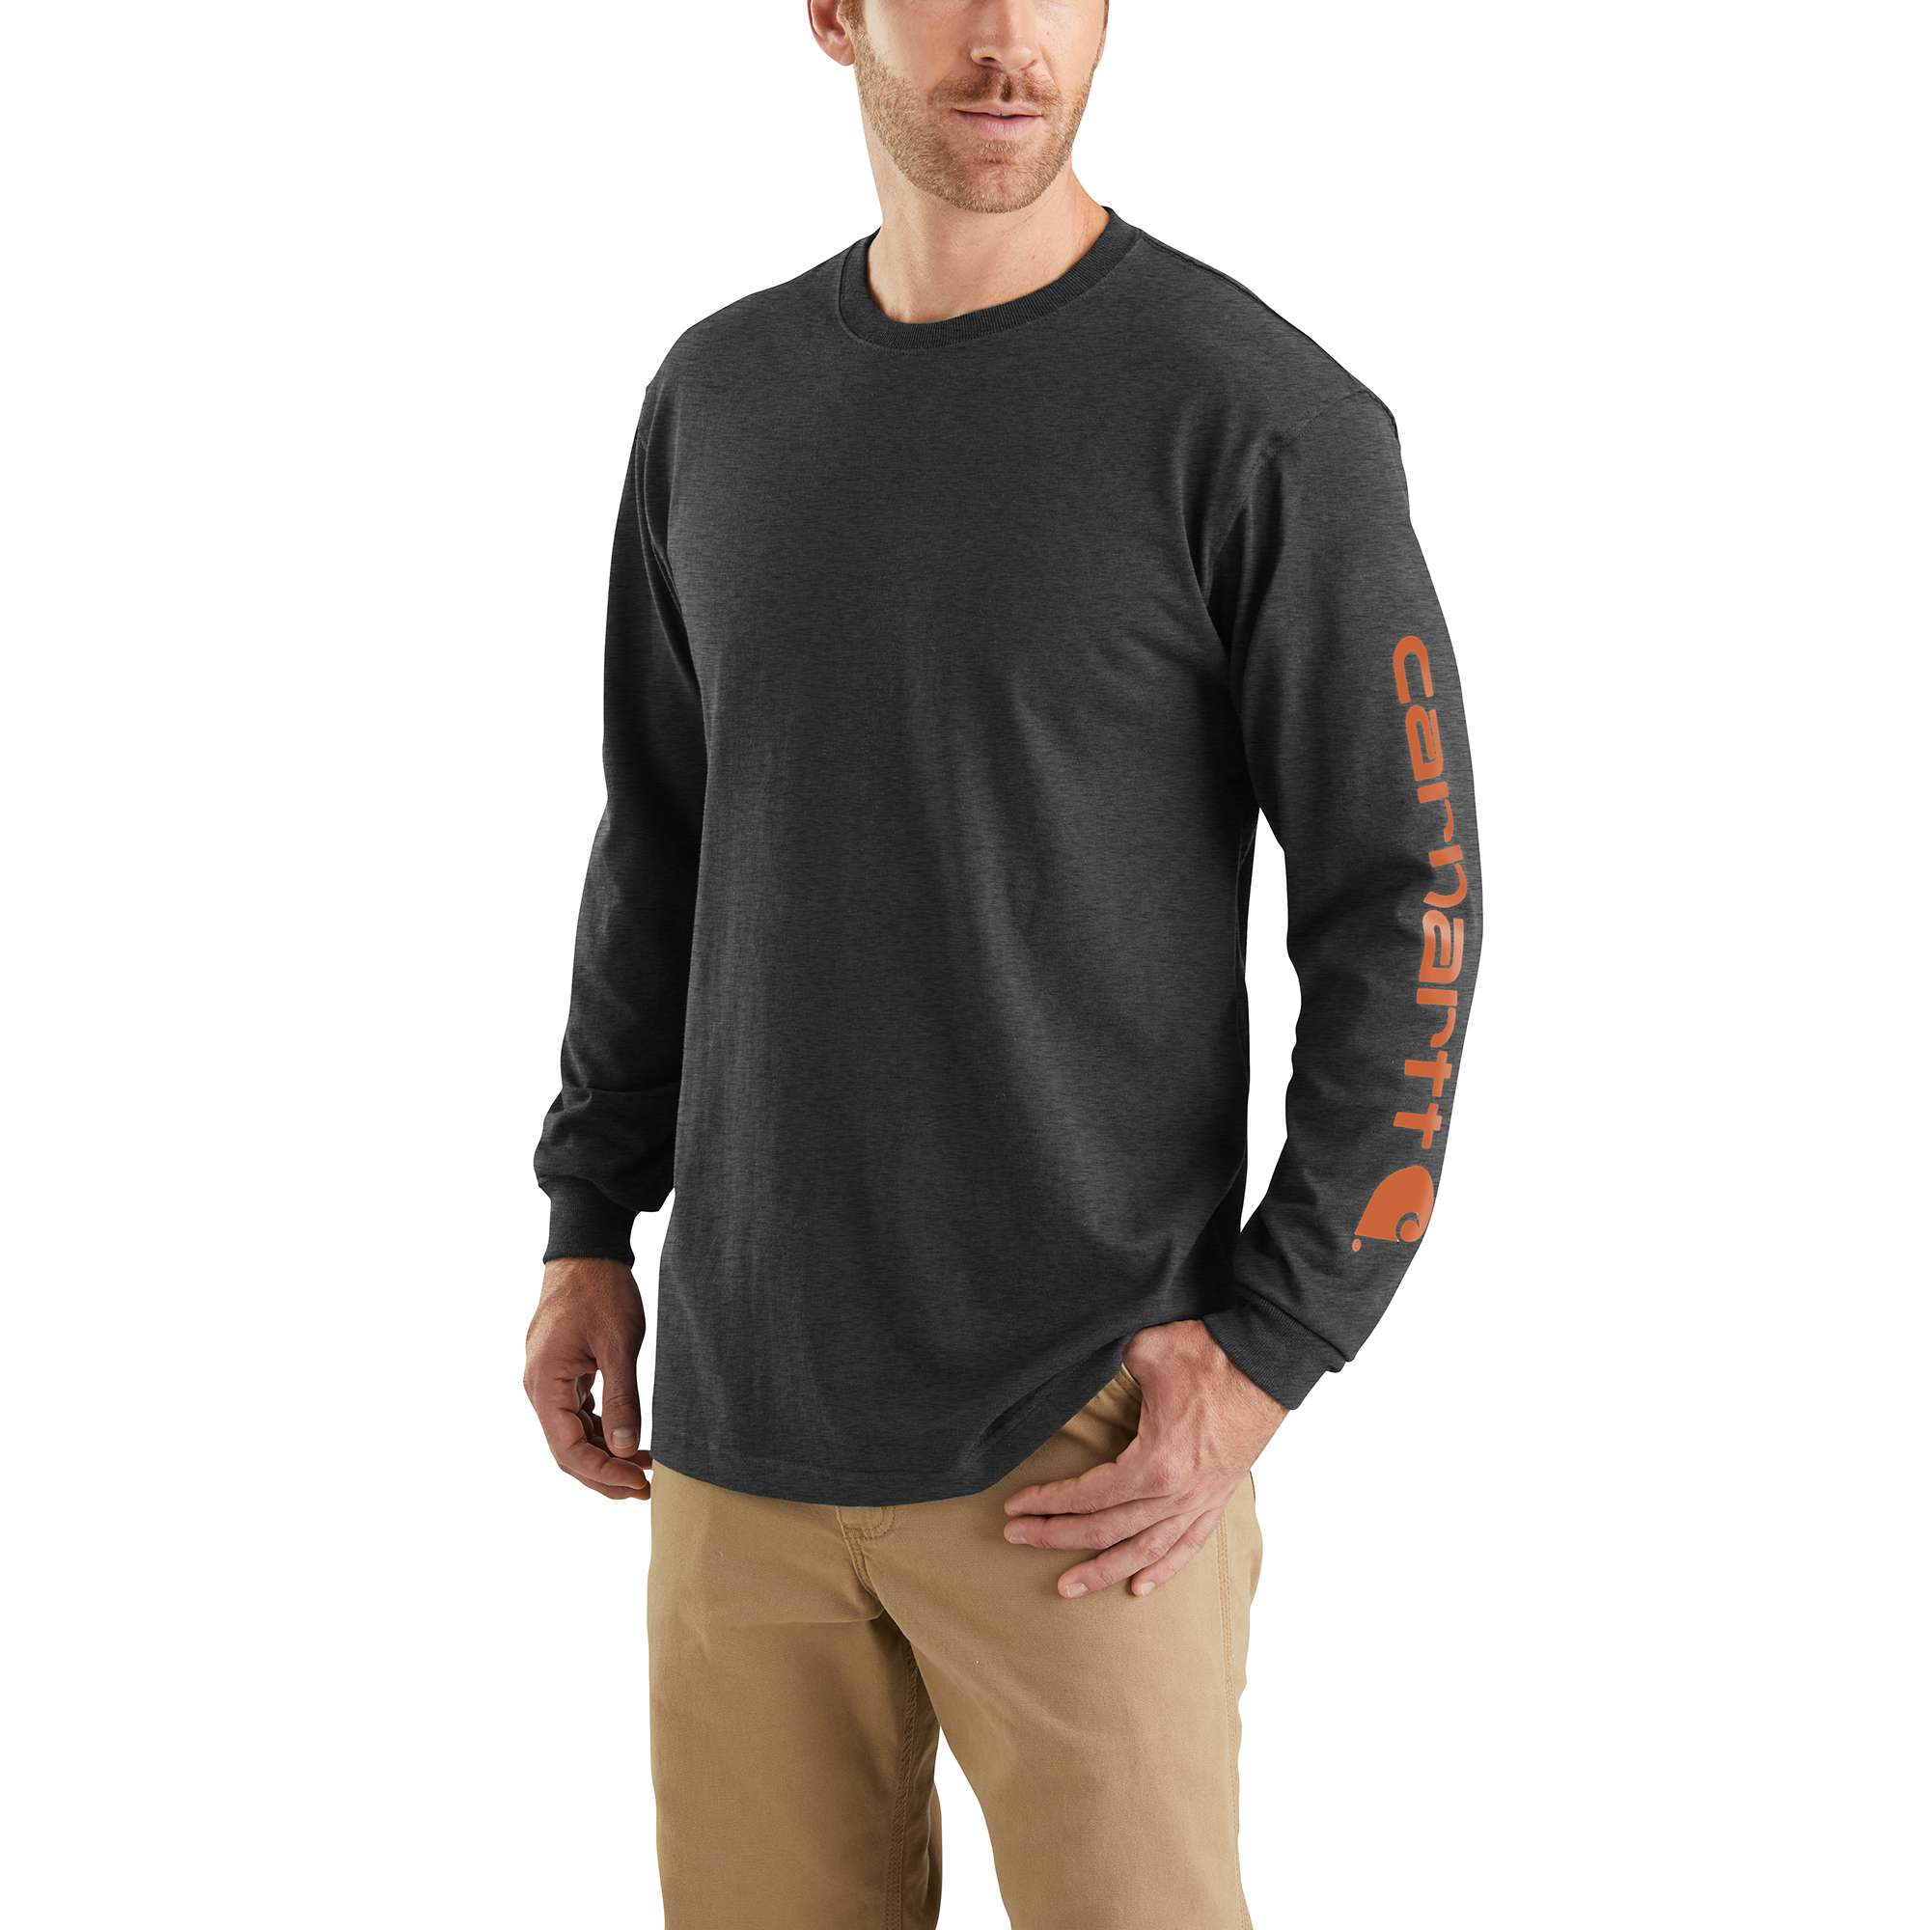 Men's Big & Tall Signature-Sleeve Logo Long-Sleeve T-Shirt, Gray, swatch